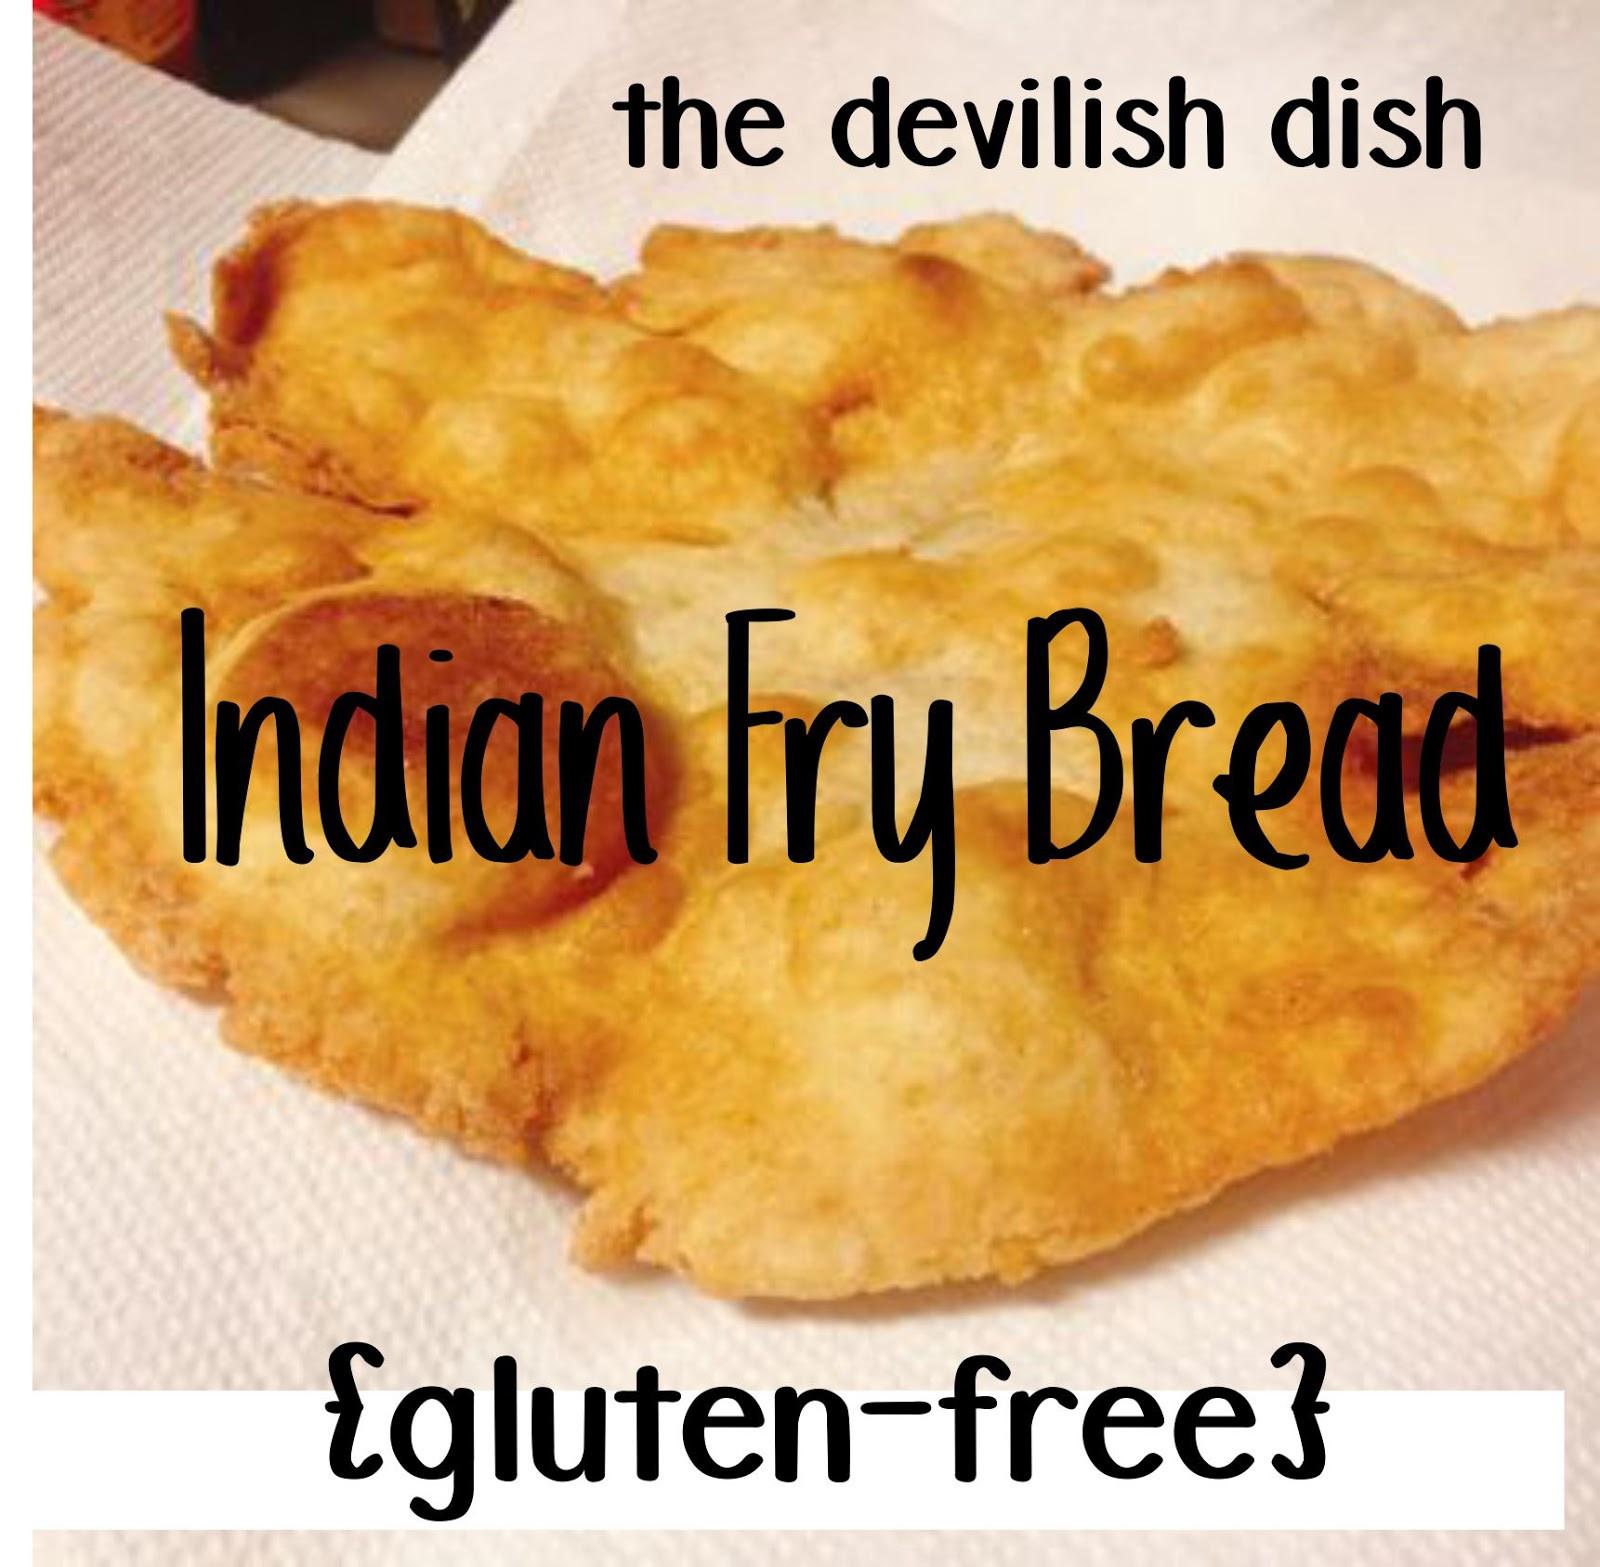 Gluten Free Fry Bread Recipe  The Devilish Dish Gluten Free Indian Fry Bread